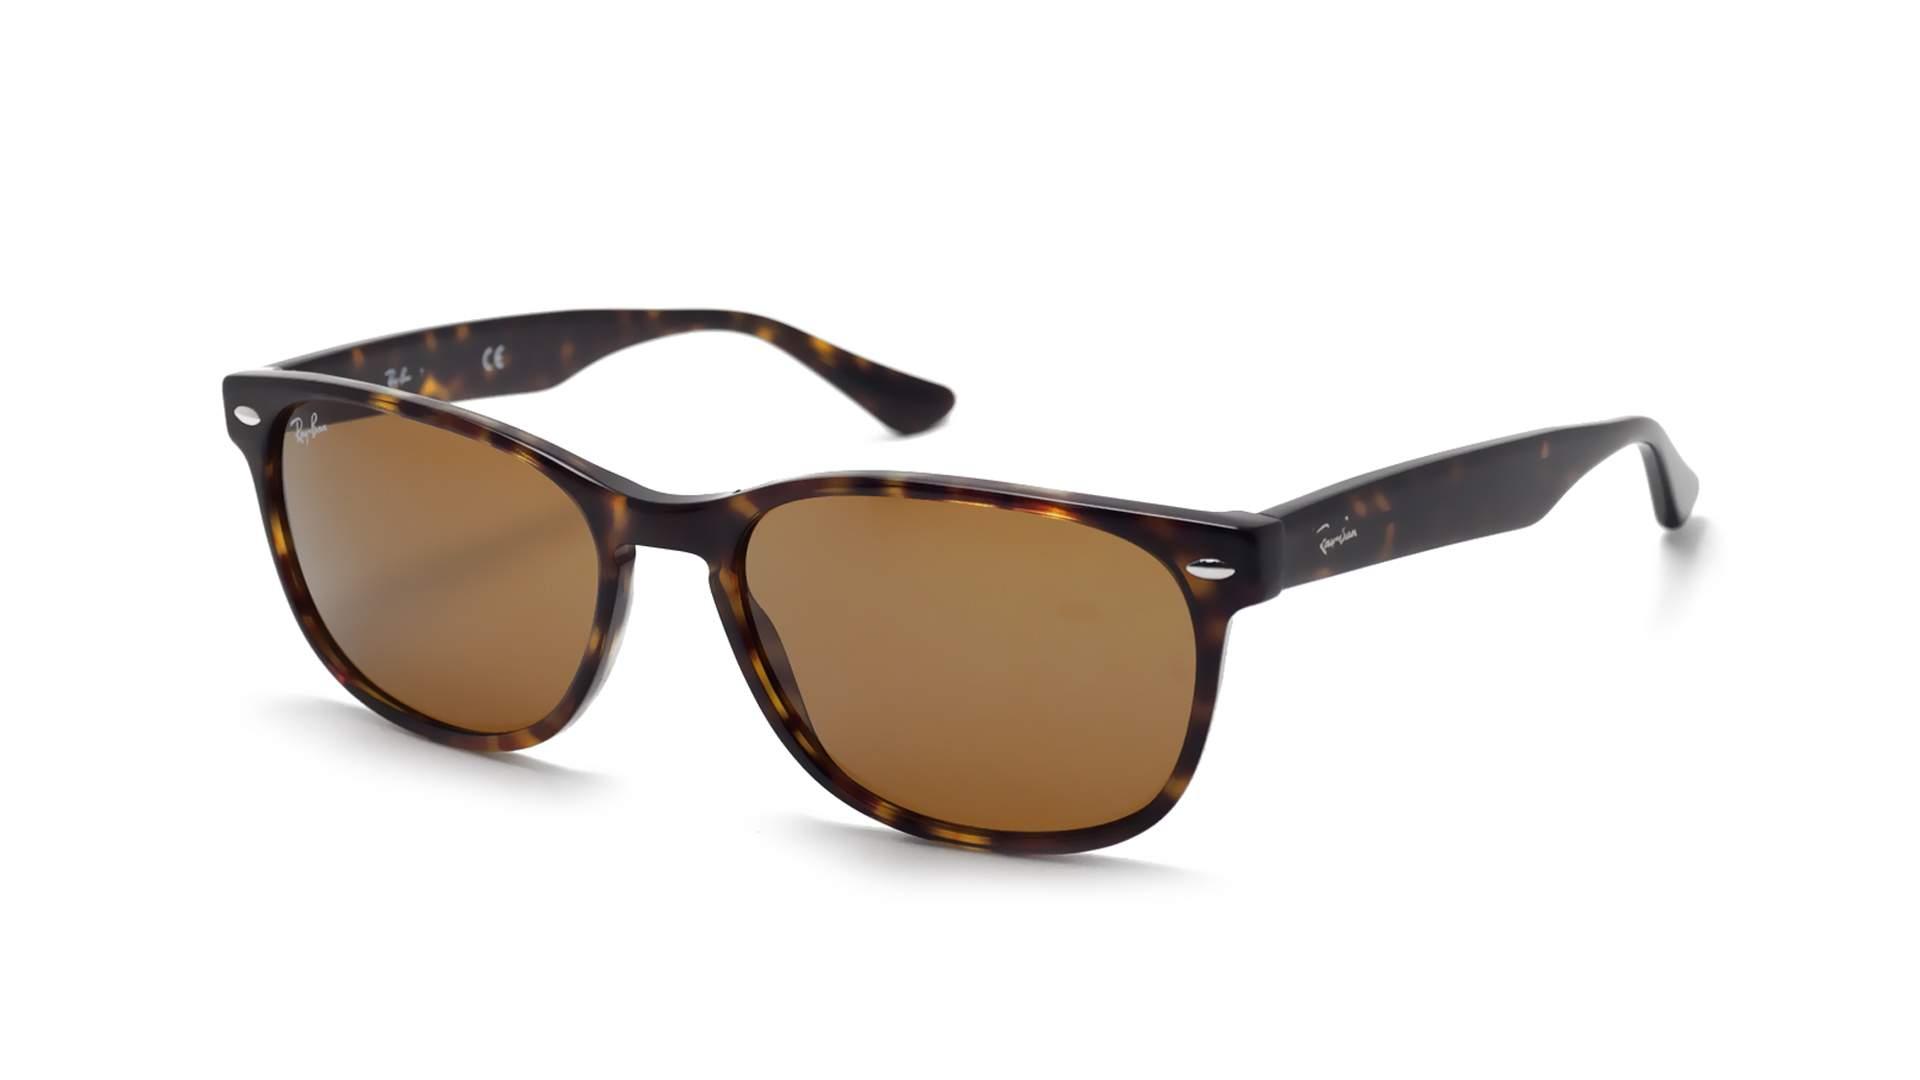 be727e3381 Sunglasses Ray-Ban RB2184 902 33 57-18 Tortoise Large